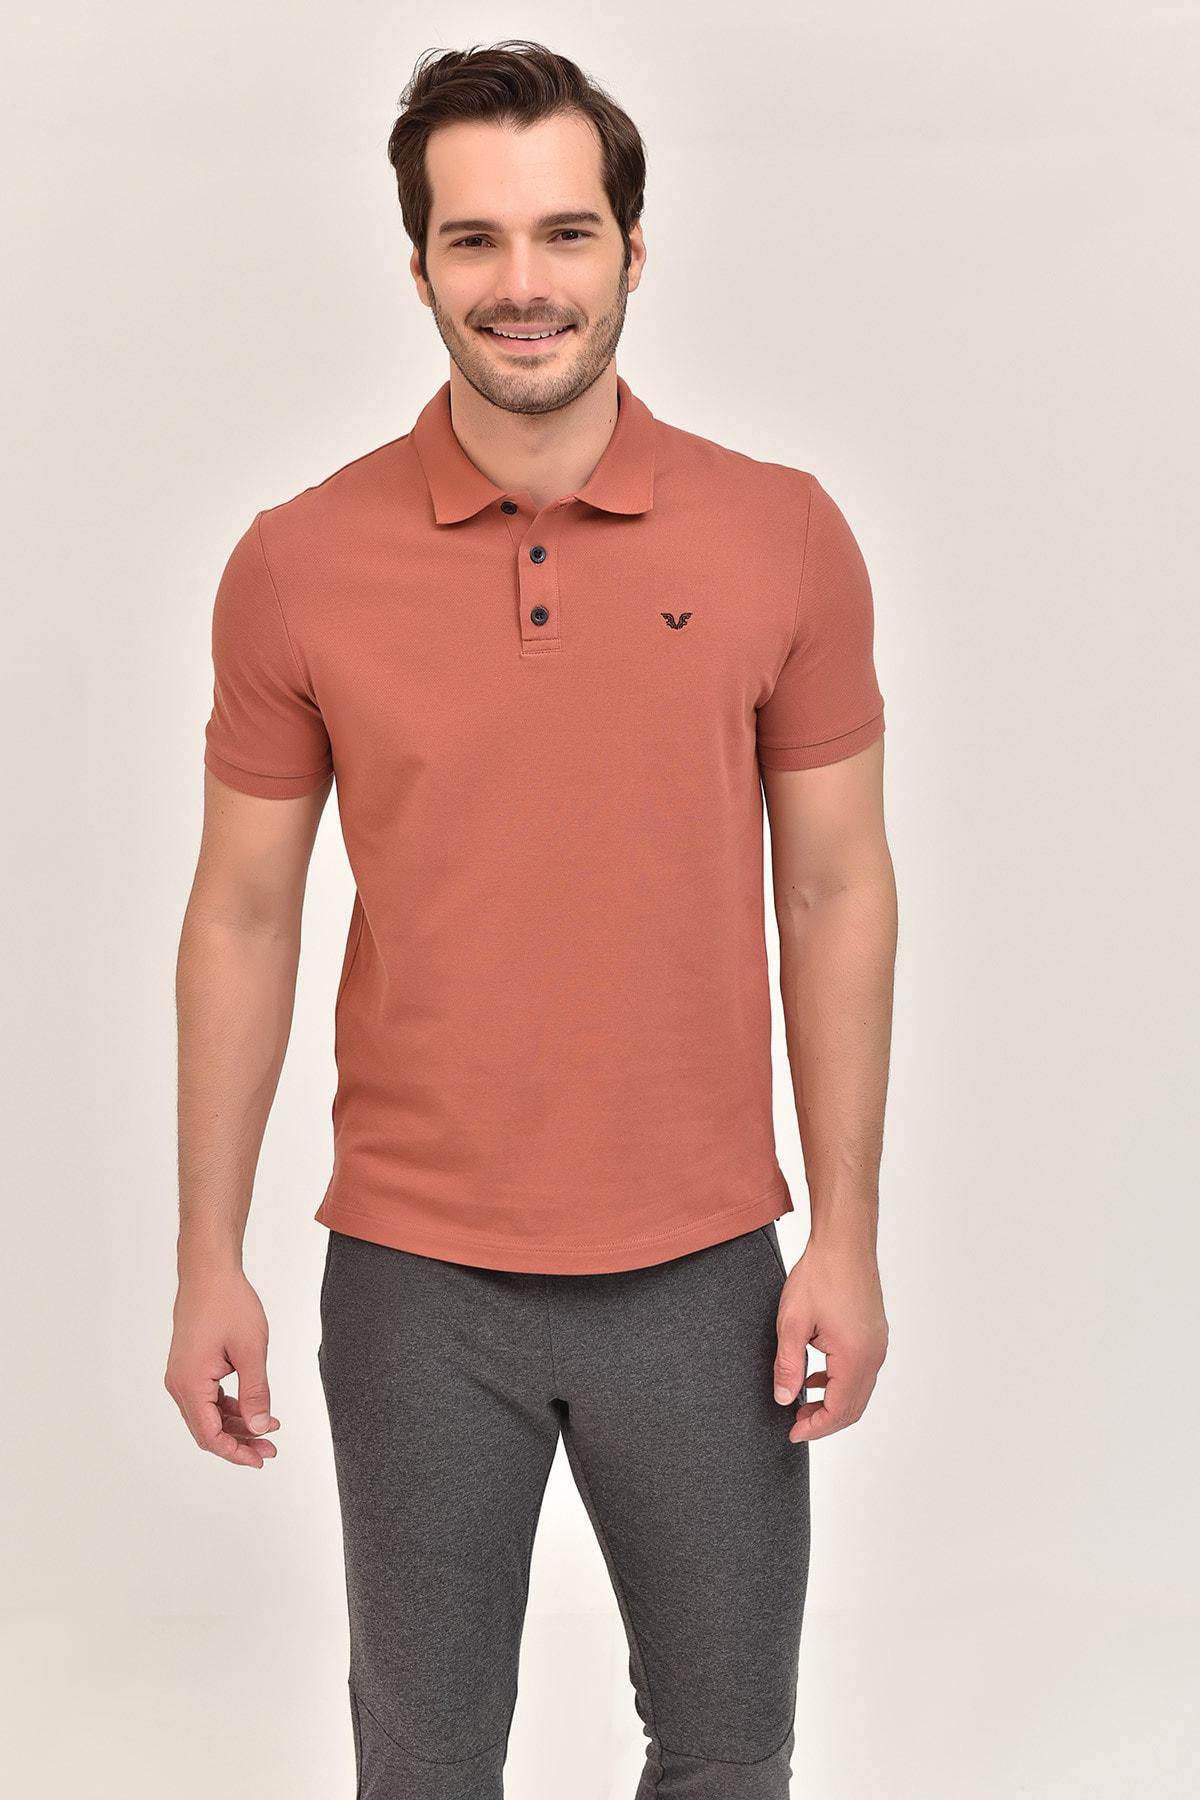 bilcee Kahverengi Erkek T-Shirt GS-8982 1